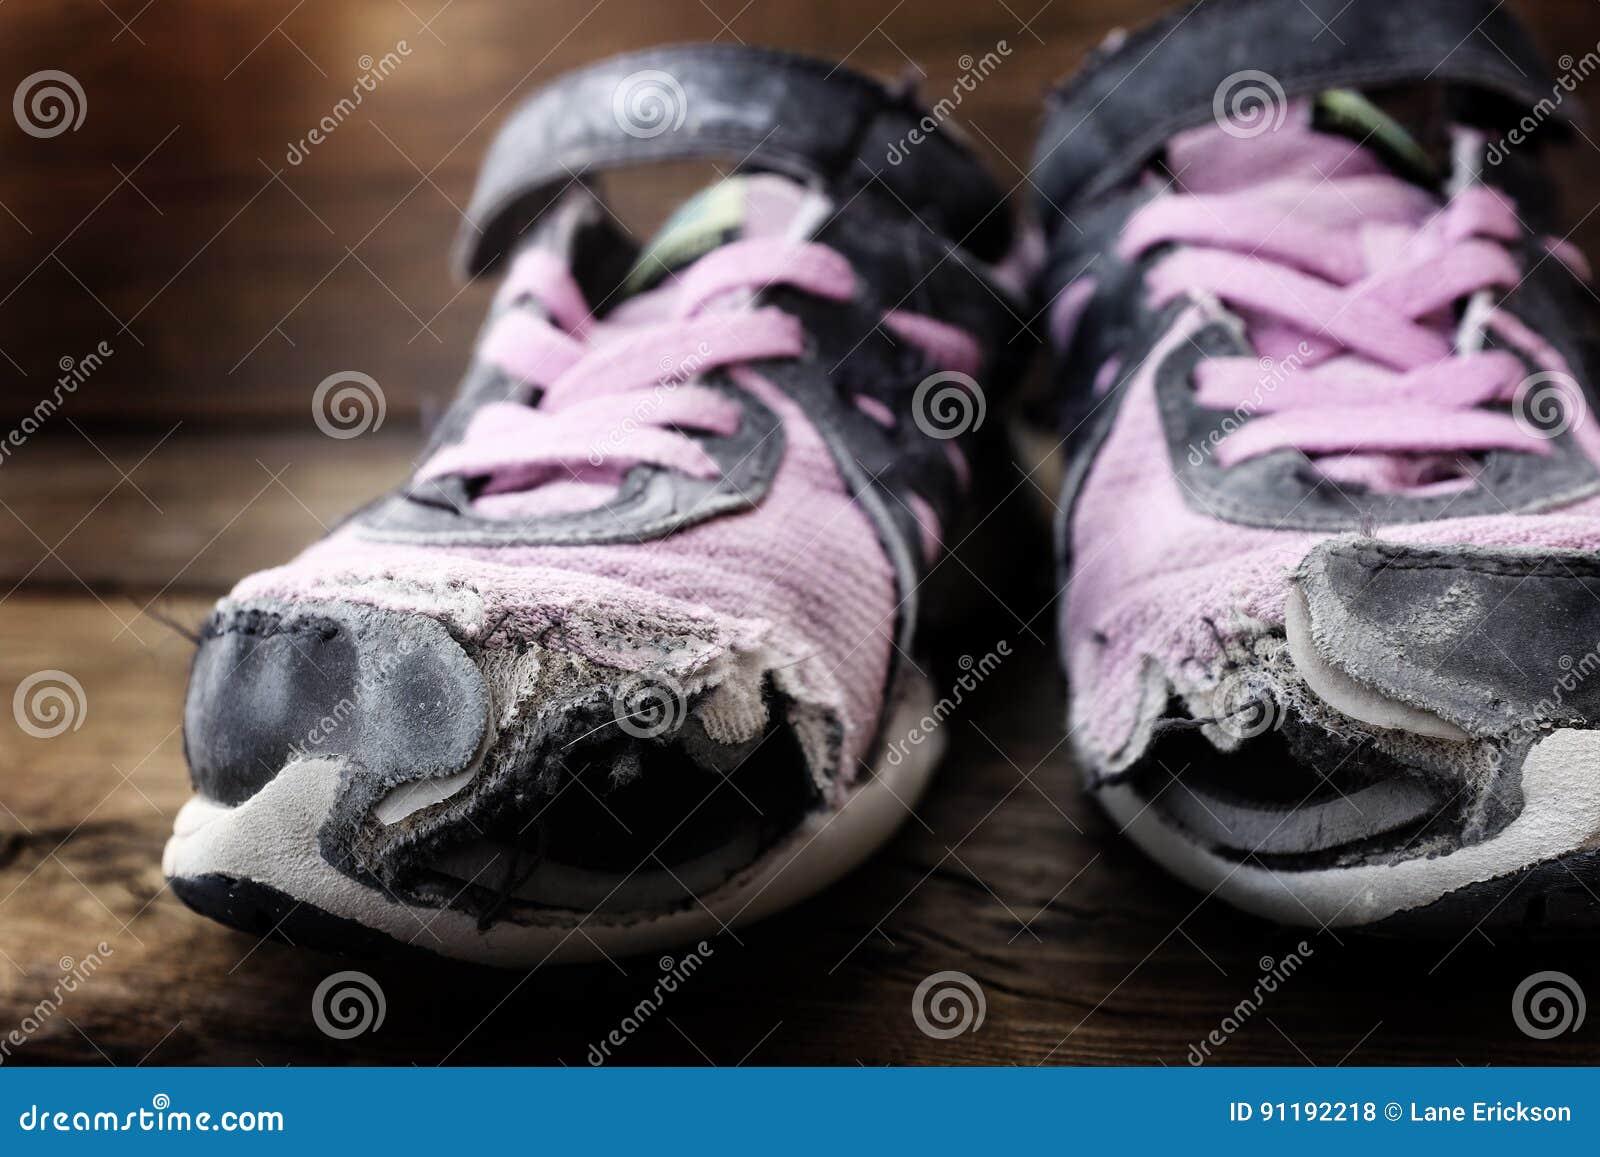 c3d30cc76da Παλαιά φθαρμένα παπούτσια με τις τρύπες Στοκ Εικόνες - εικόνα από ...